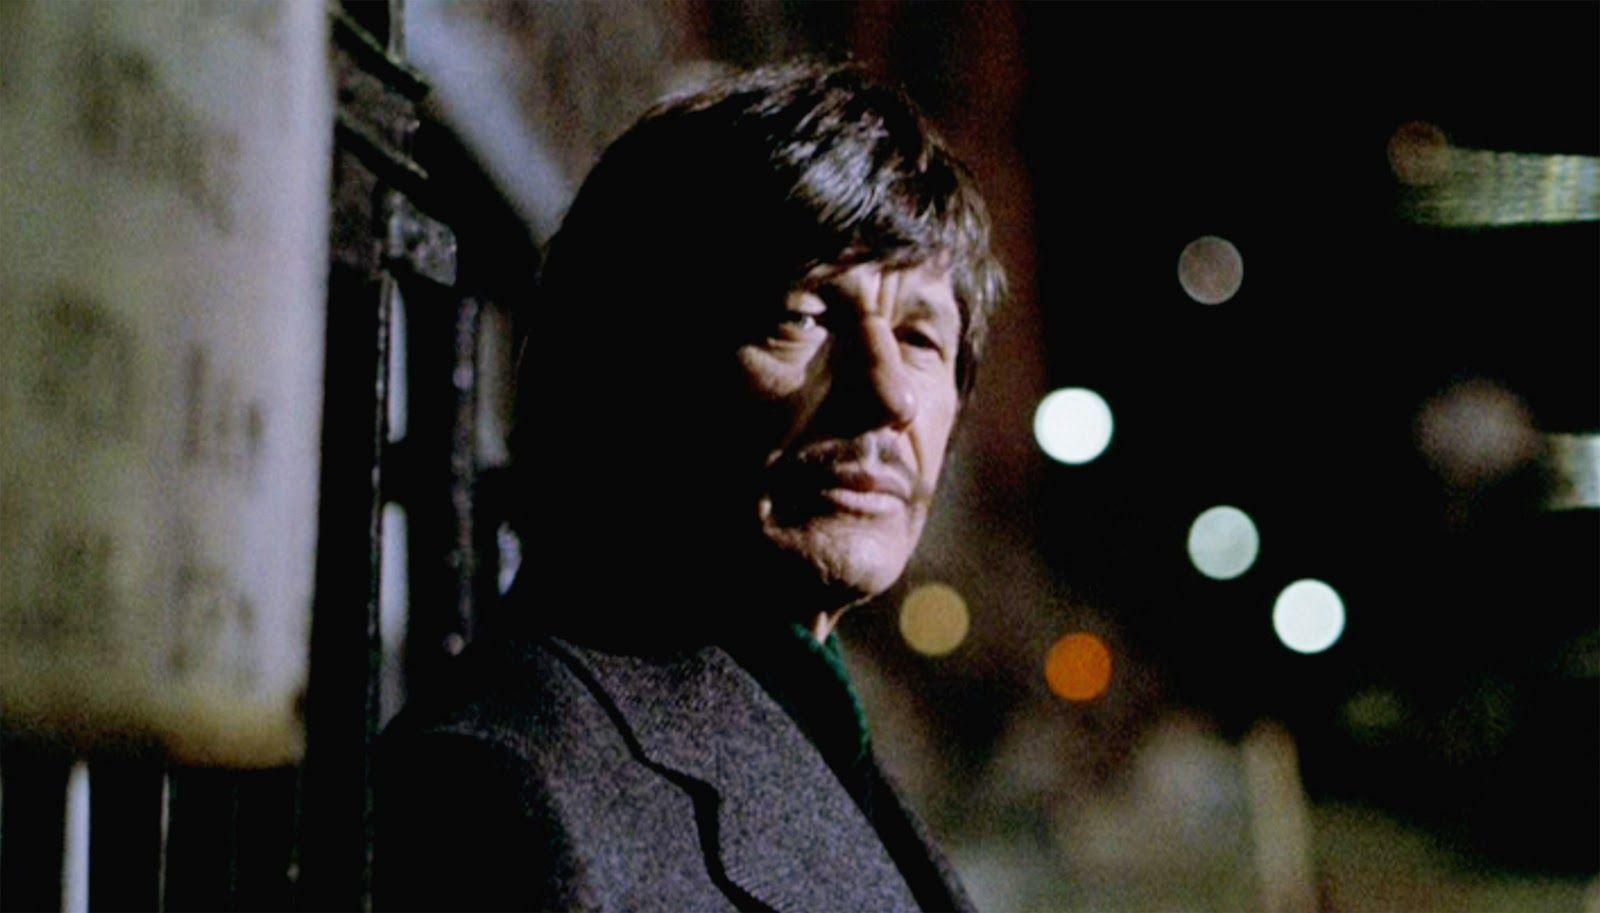 Death Wish Remake Loses Big Bad Wolves Directors | Collider